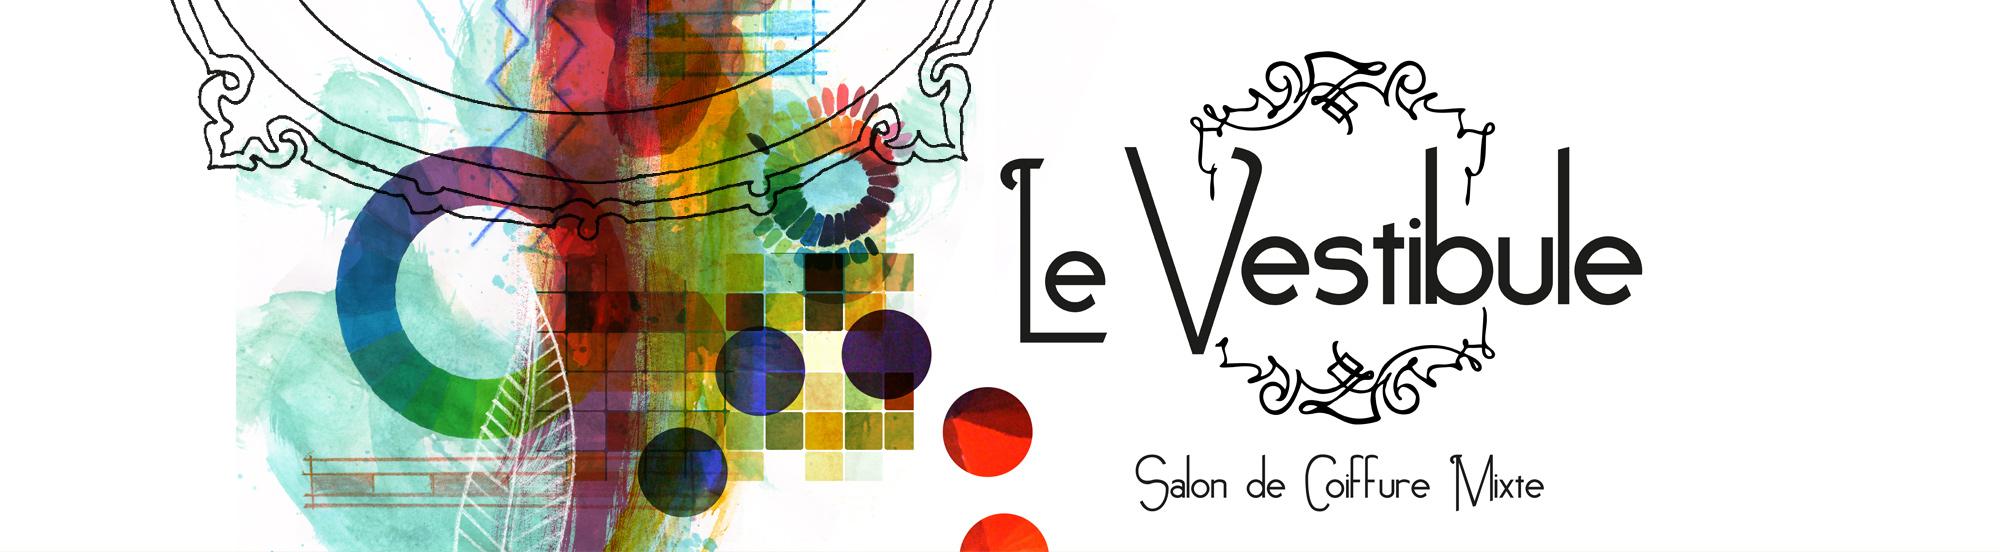 01_LE-SALON_01